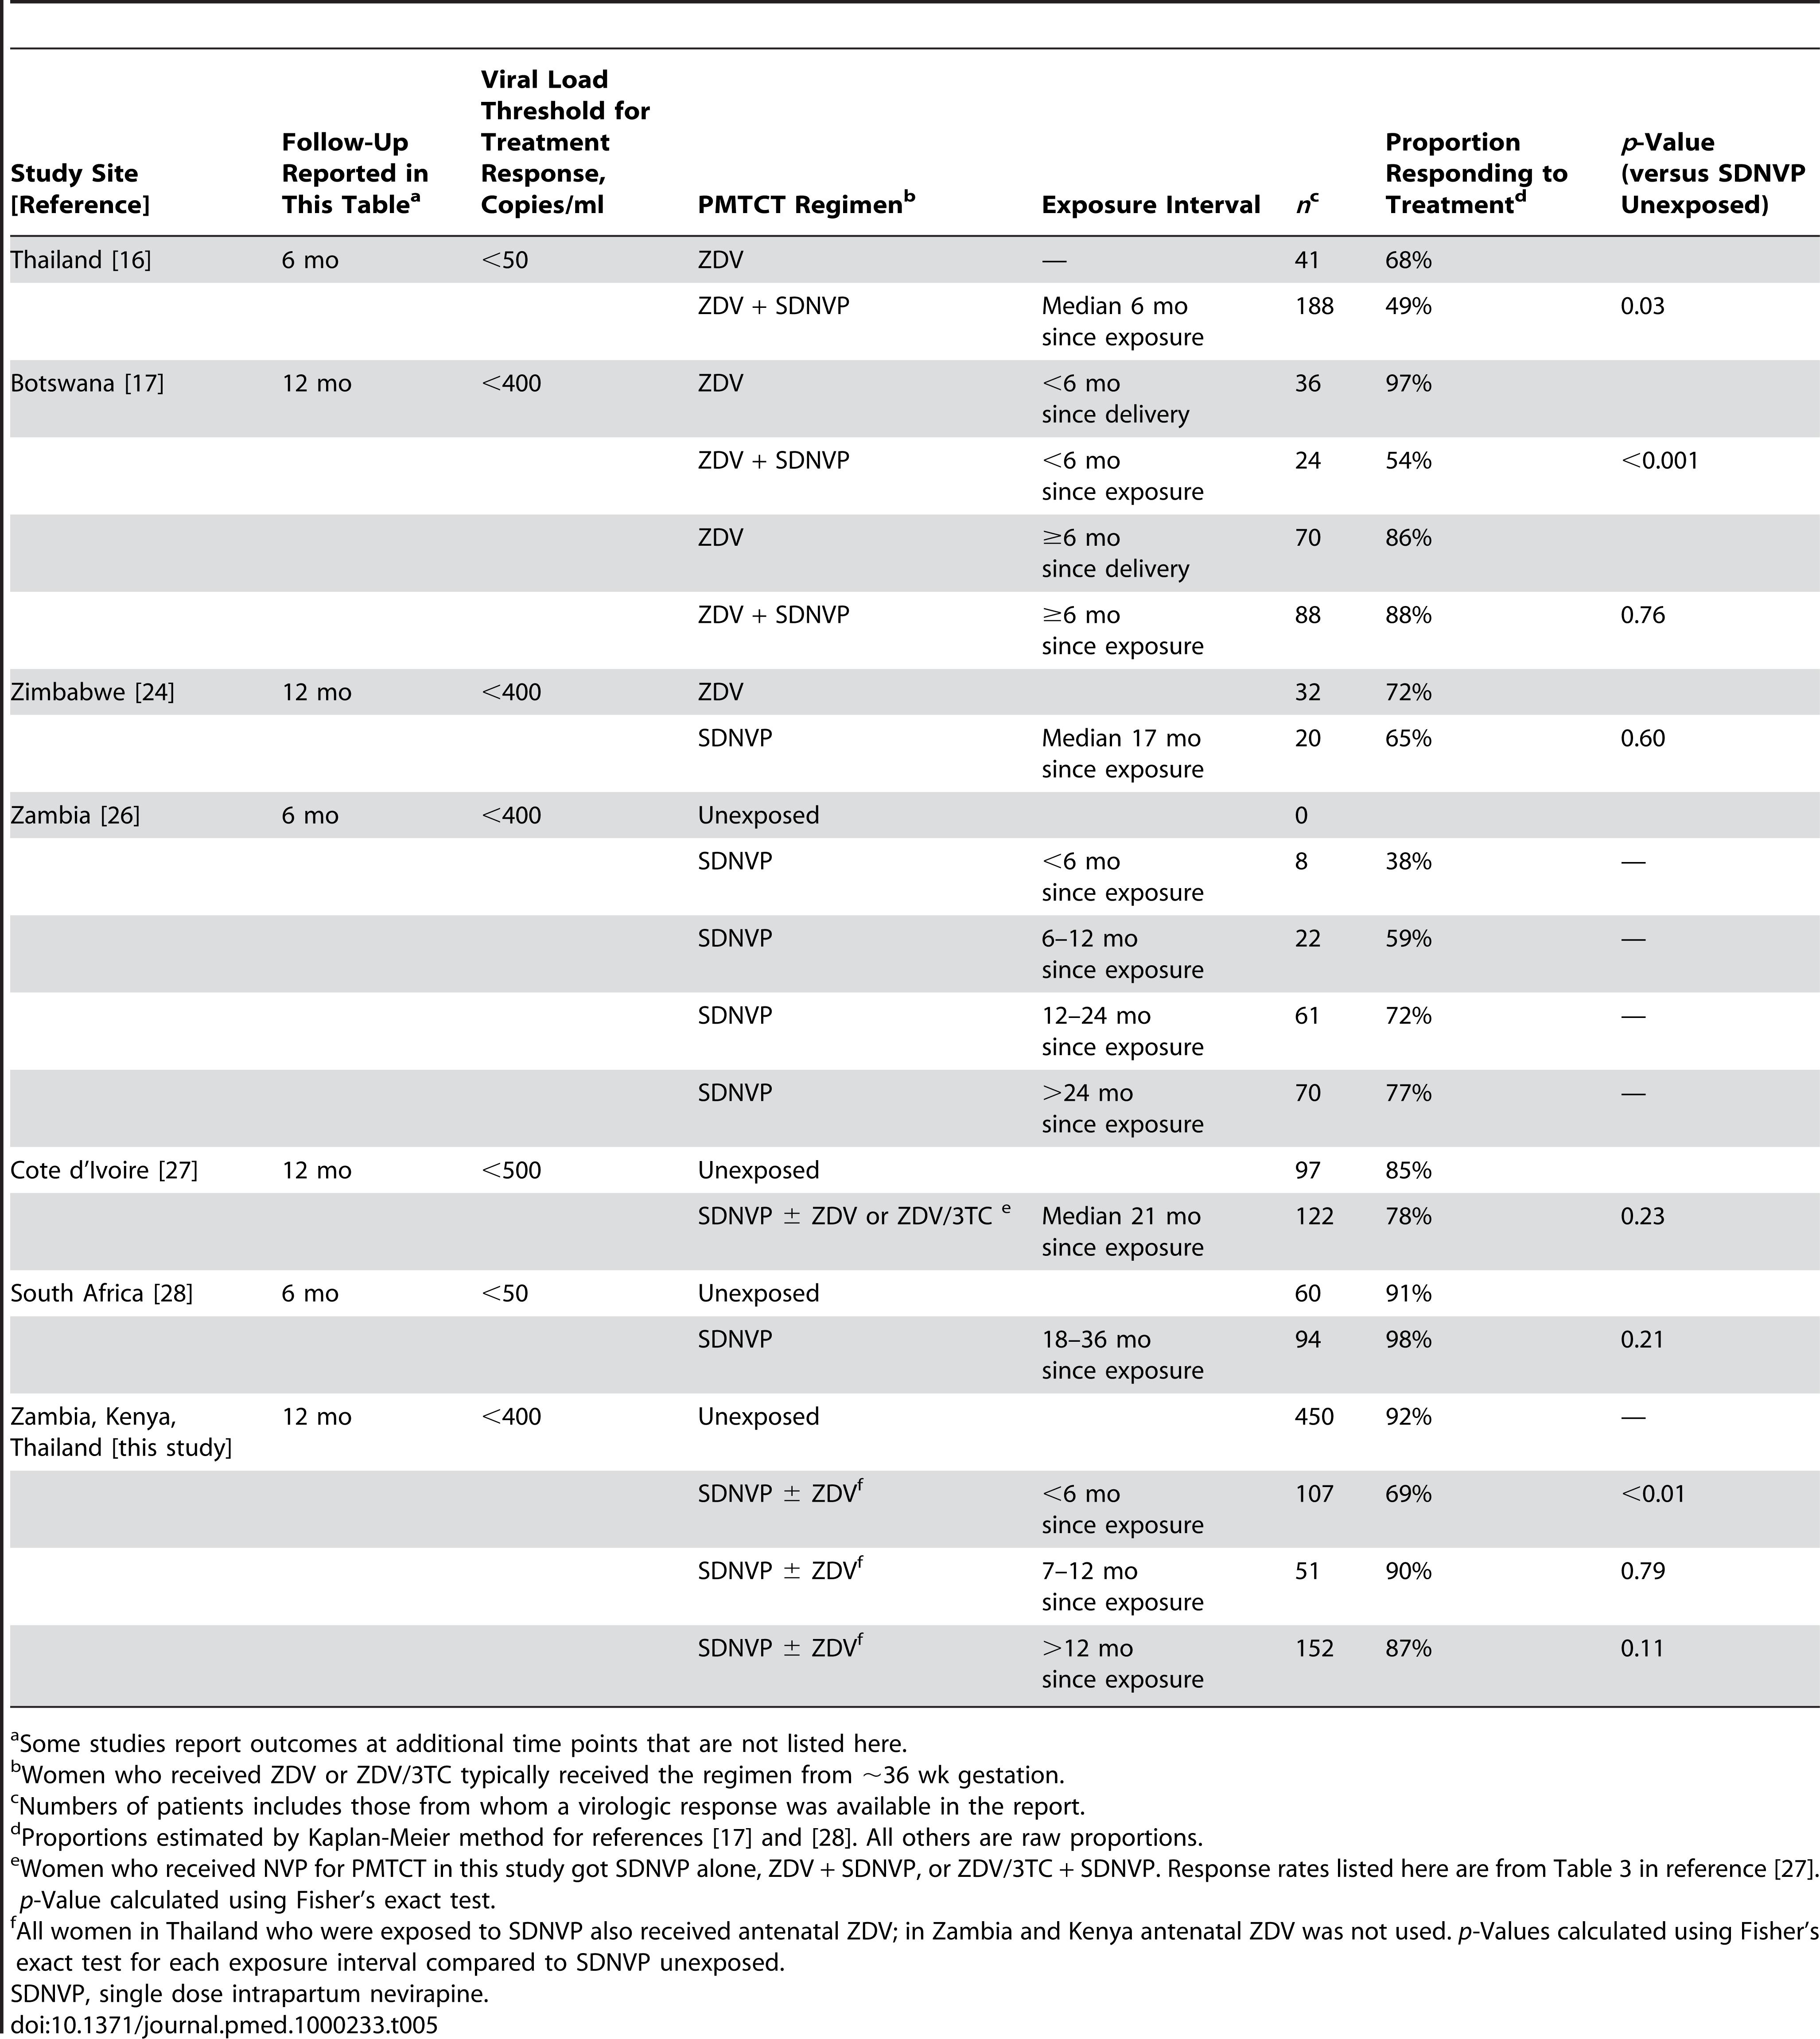 Studies of virologic response rates to NNRTI-based treatment among women previously exposed to single-dose NVP.